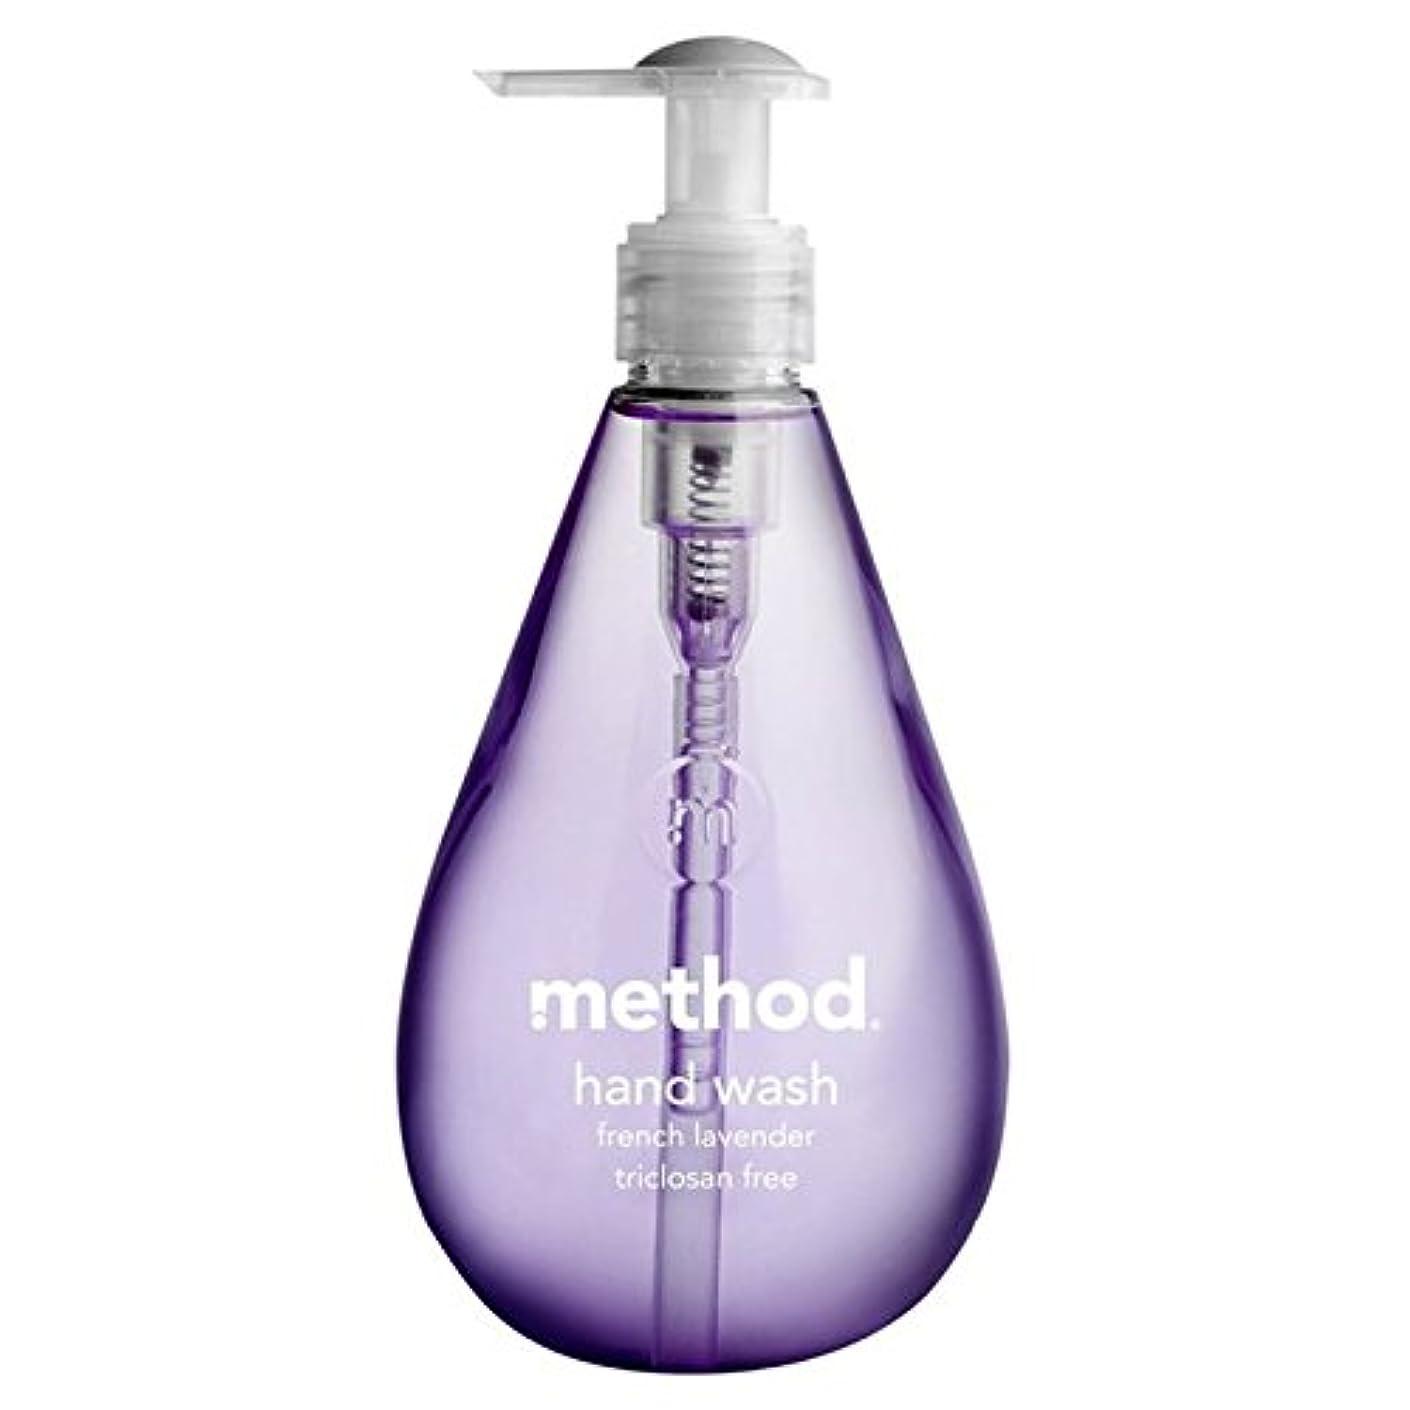 Method French Lavender Handsoap 354ml - メソッドフレンチラベンダーの354ミリリットル [並行輸入品]